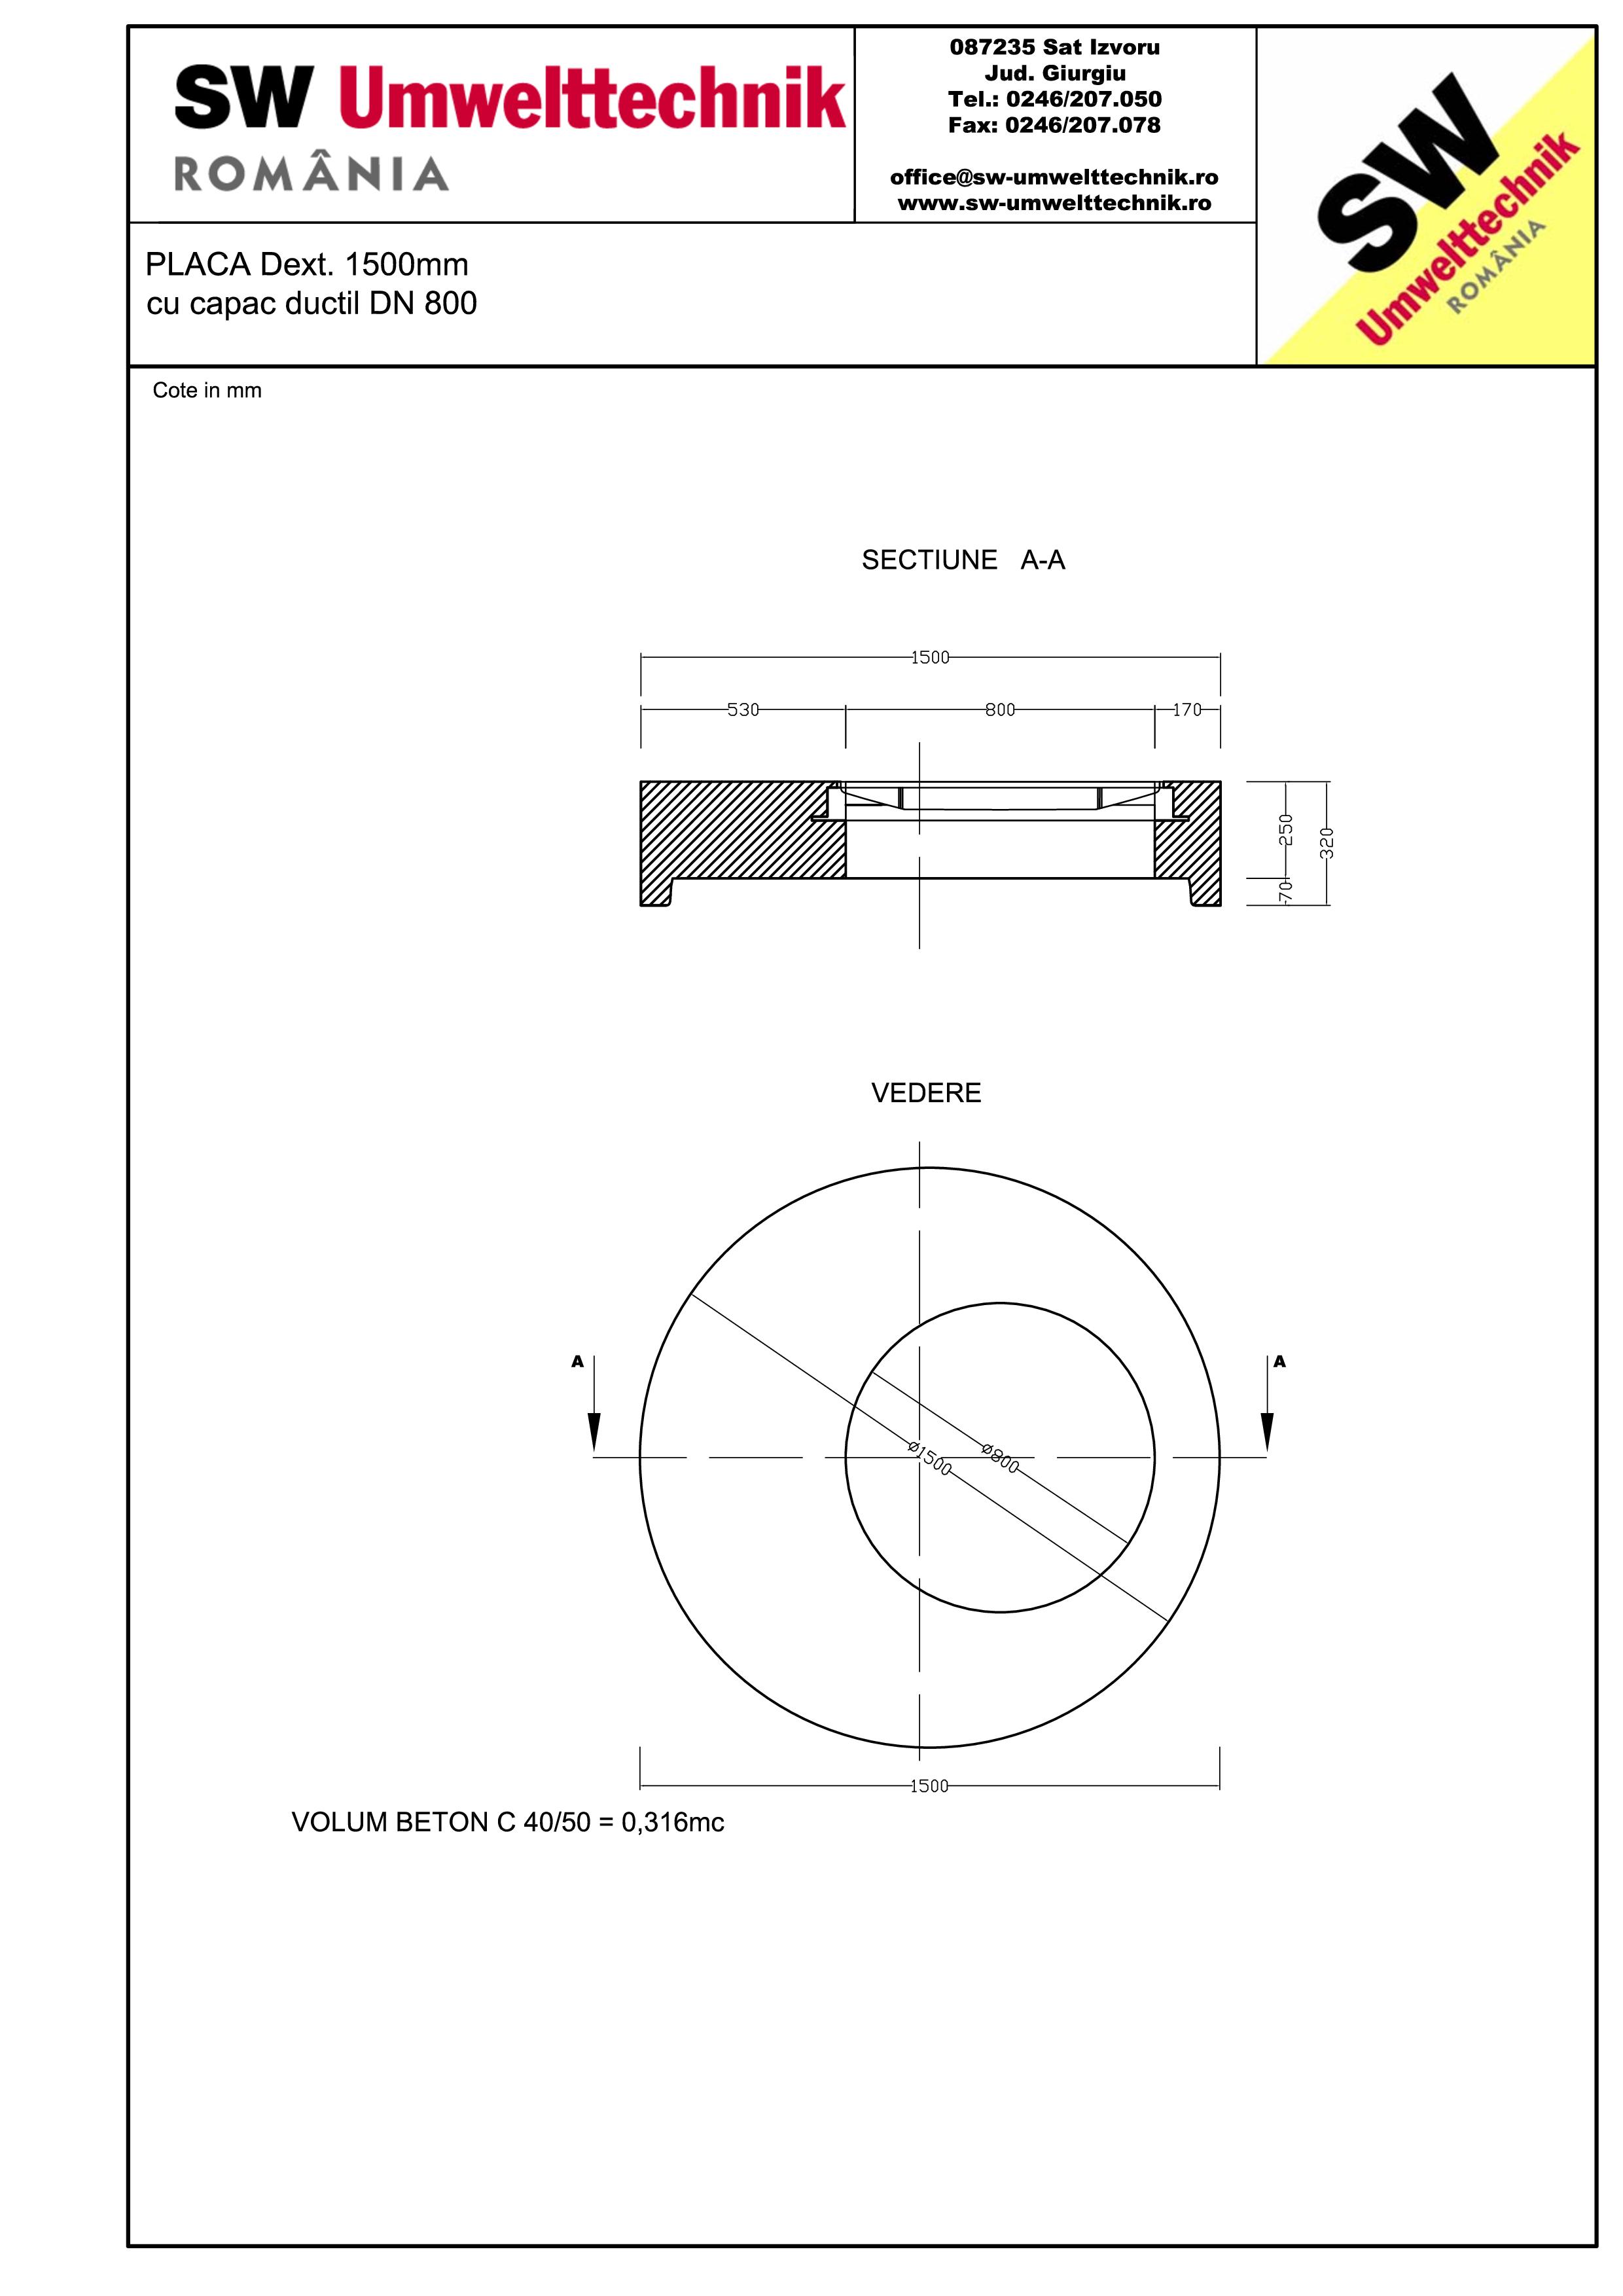 Pagina 1 - CAD-PDF Placa Dext.1500 H250 cu capac ductil DN800 SW UMWELTTECHNIK Detaliu de produs